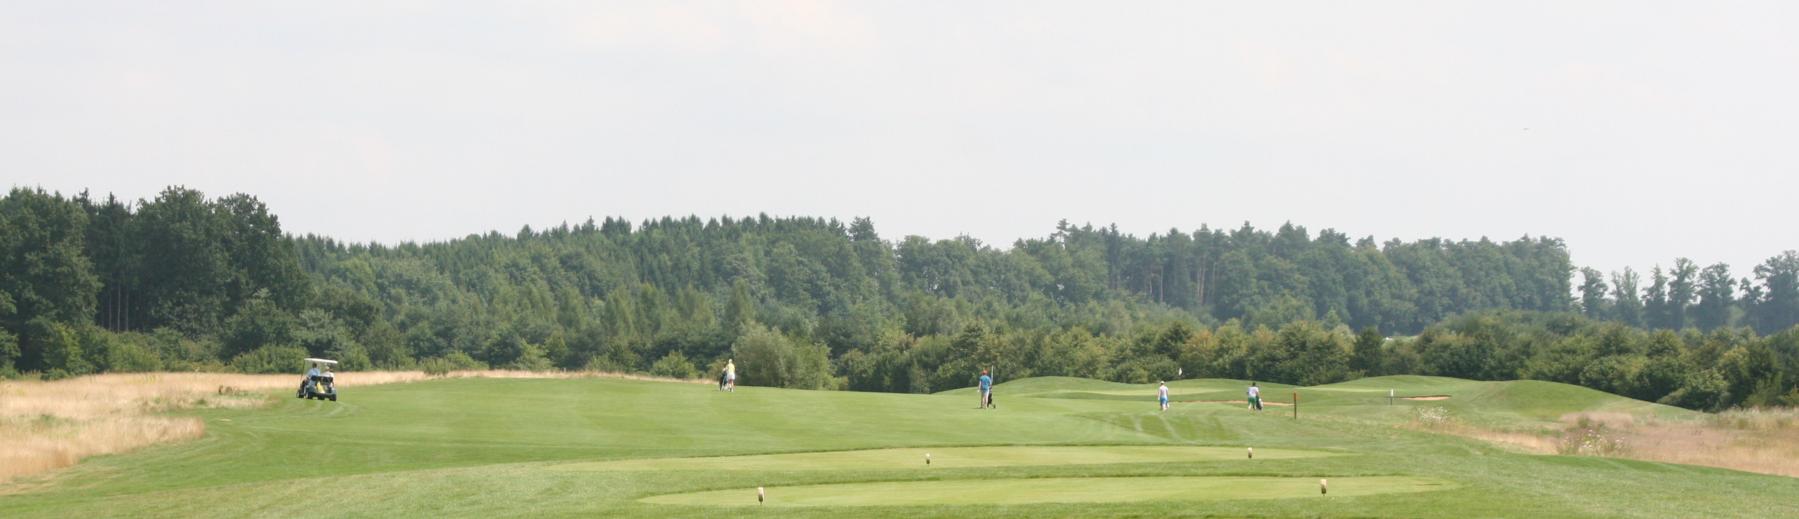 Kratzer  EDV Golf Cup 2020